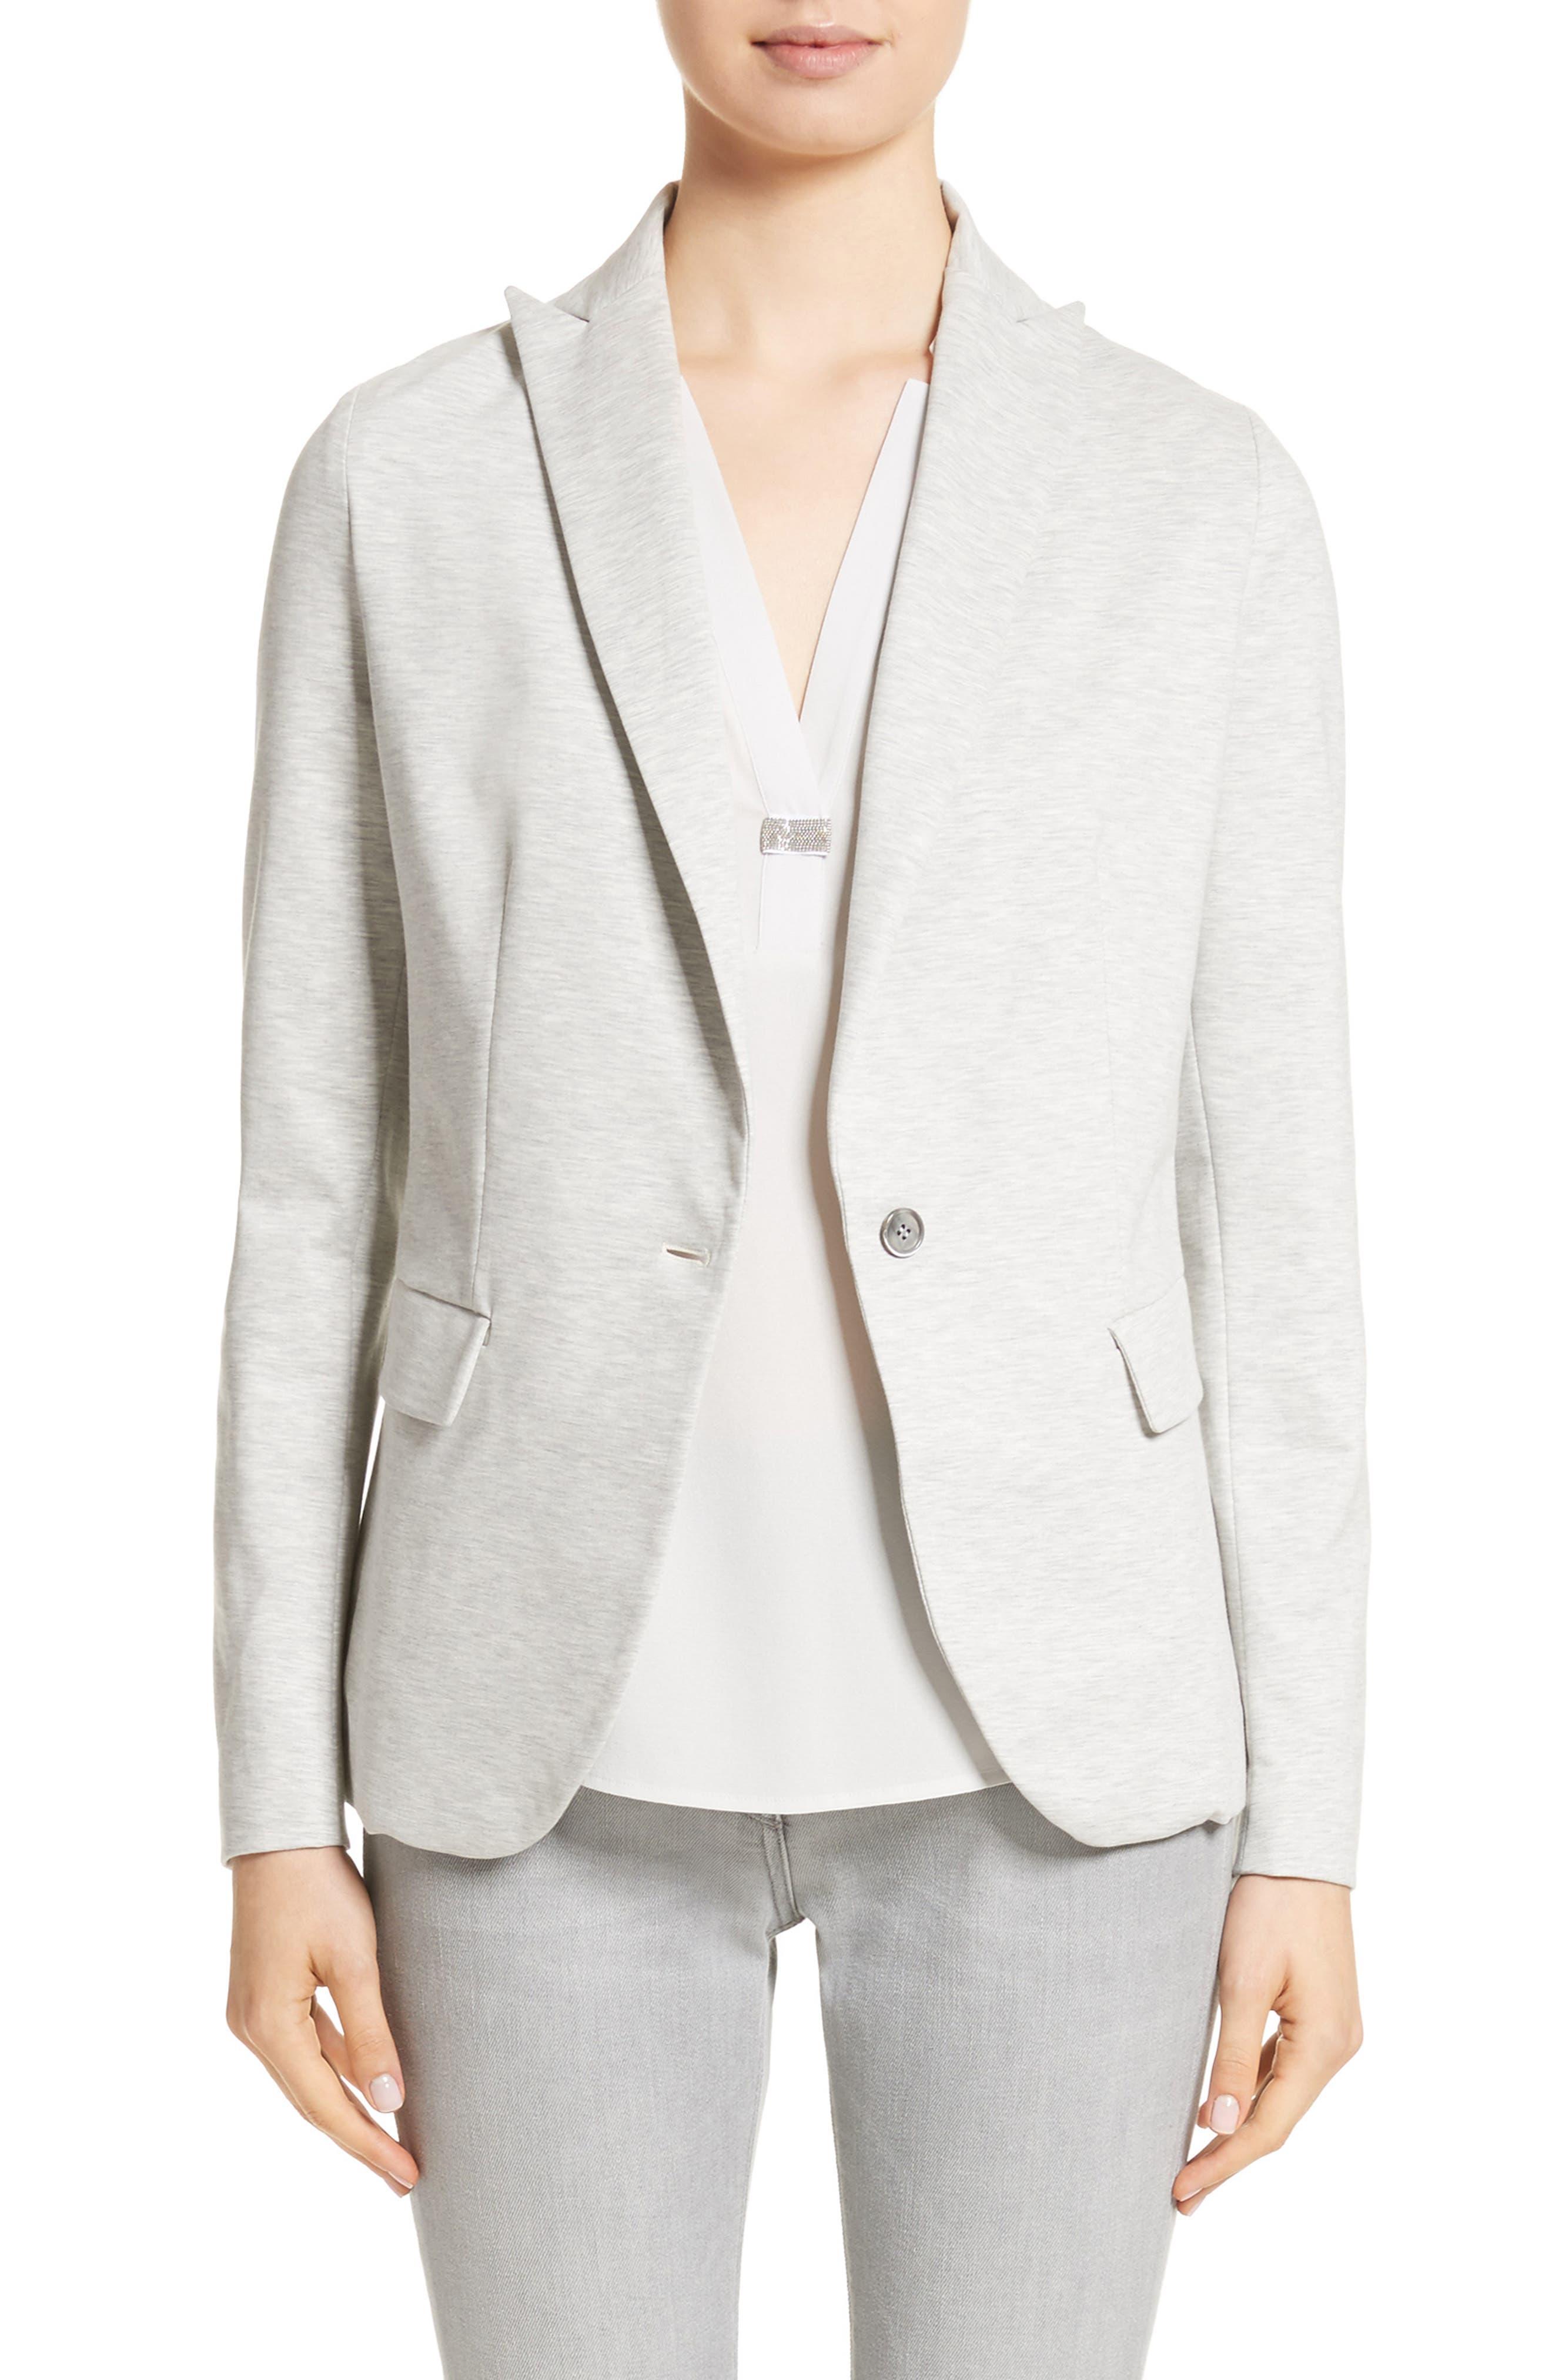 Rodier Jersey Blazer,                             Main thumbnail 1, color,                             Pearl Grey